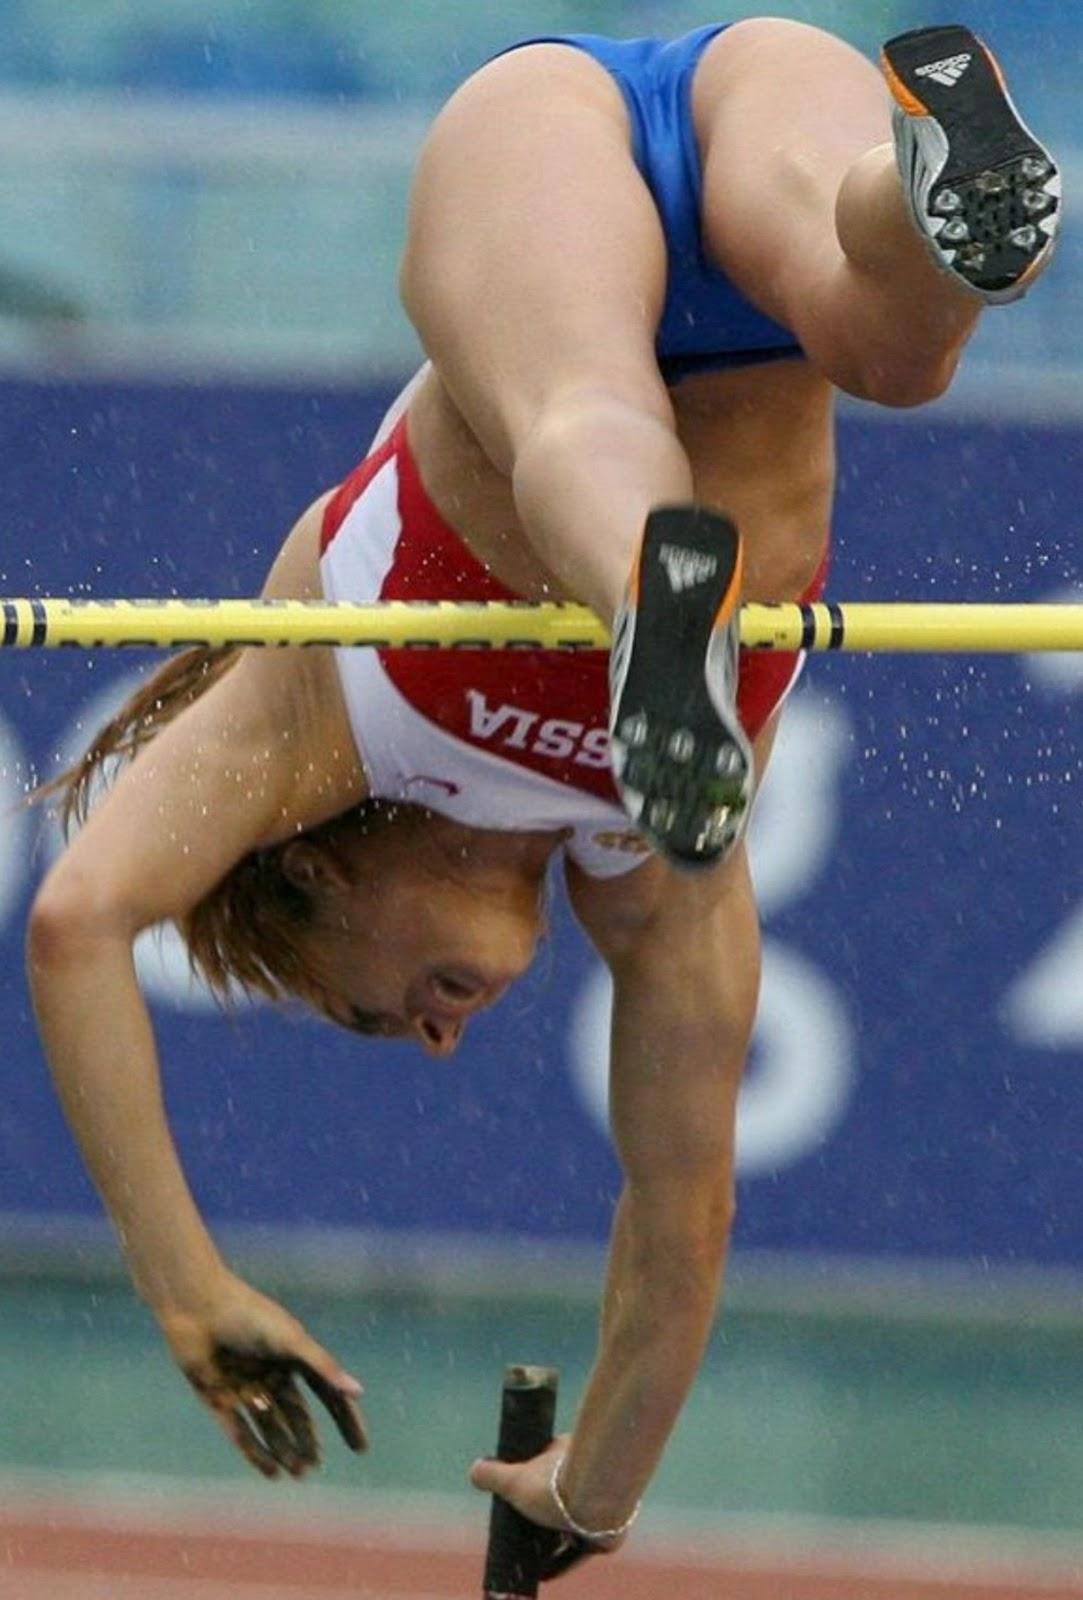 image Yarisley silva sexy ass cuban olympics pole vault ameman